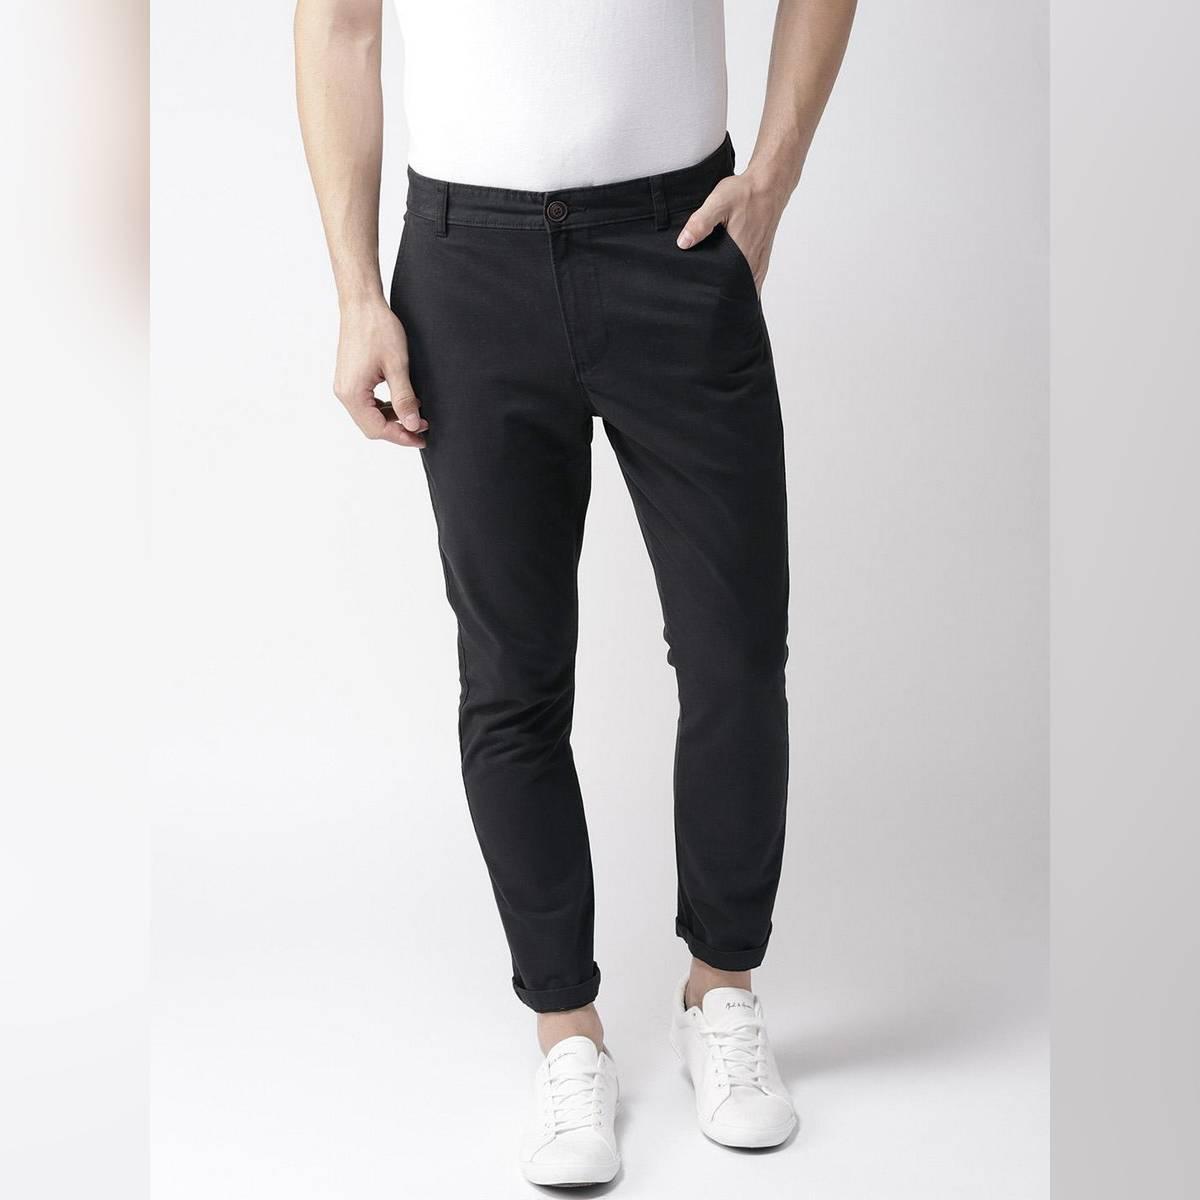 Slimfit Black Stretchable Cotton  Chinos